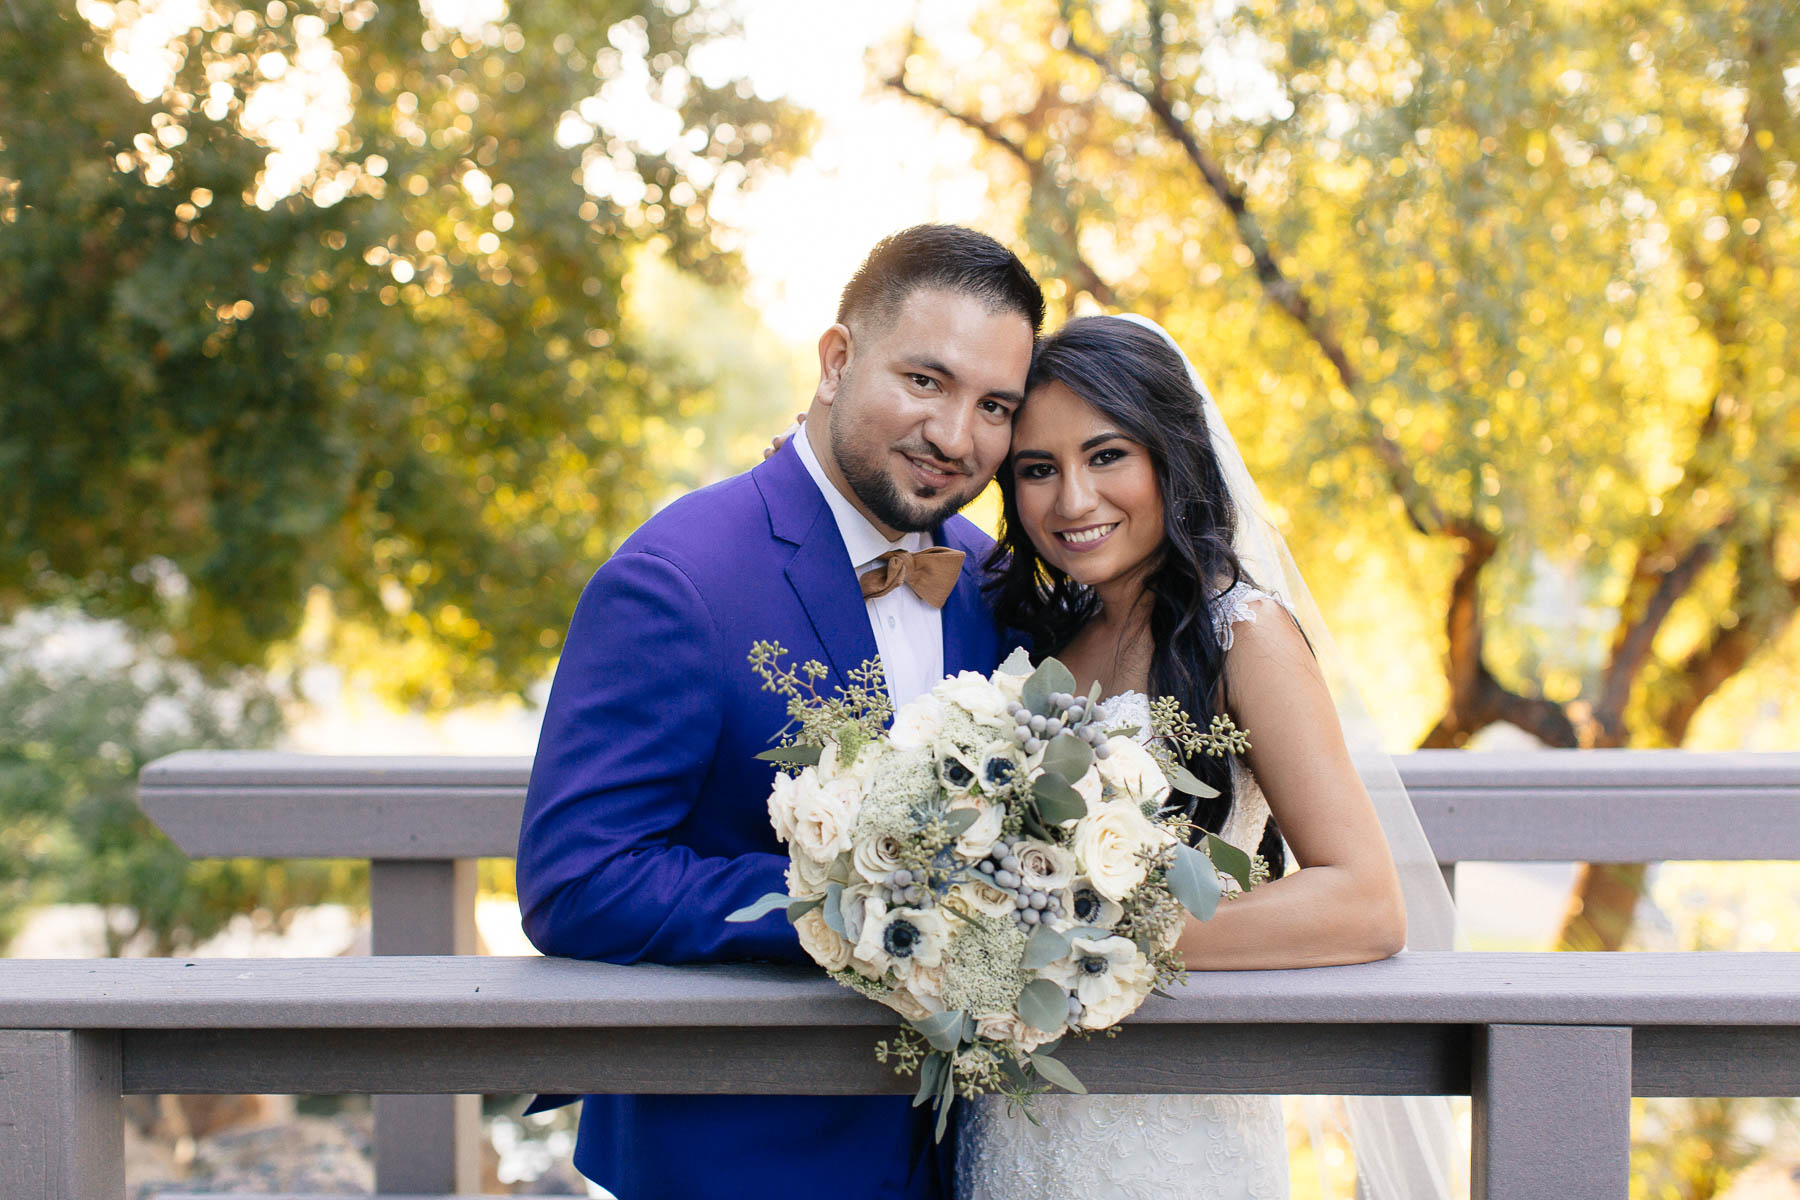 161029-Luxium-Weddings-Arizona-Jeff-Griselda-First-Look-Val-Vista-Lakes-Gilber-059.jpg